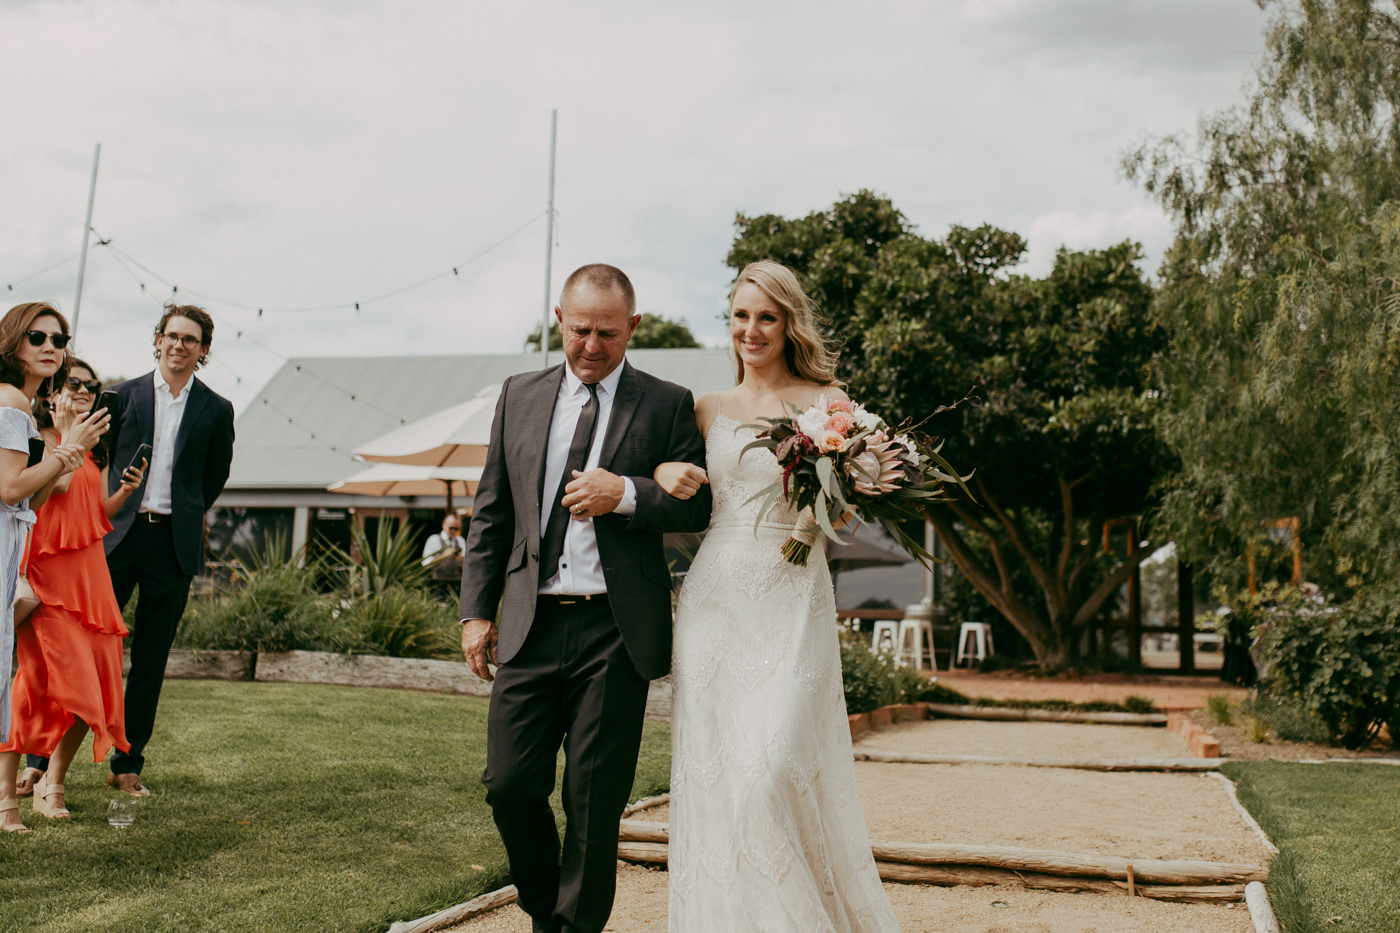 Anthony & Eliet - Wagga Wagga Wedding - Country NSW - Samantha Heather Photography-96.jpg